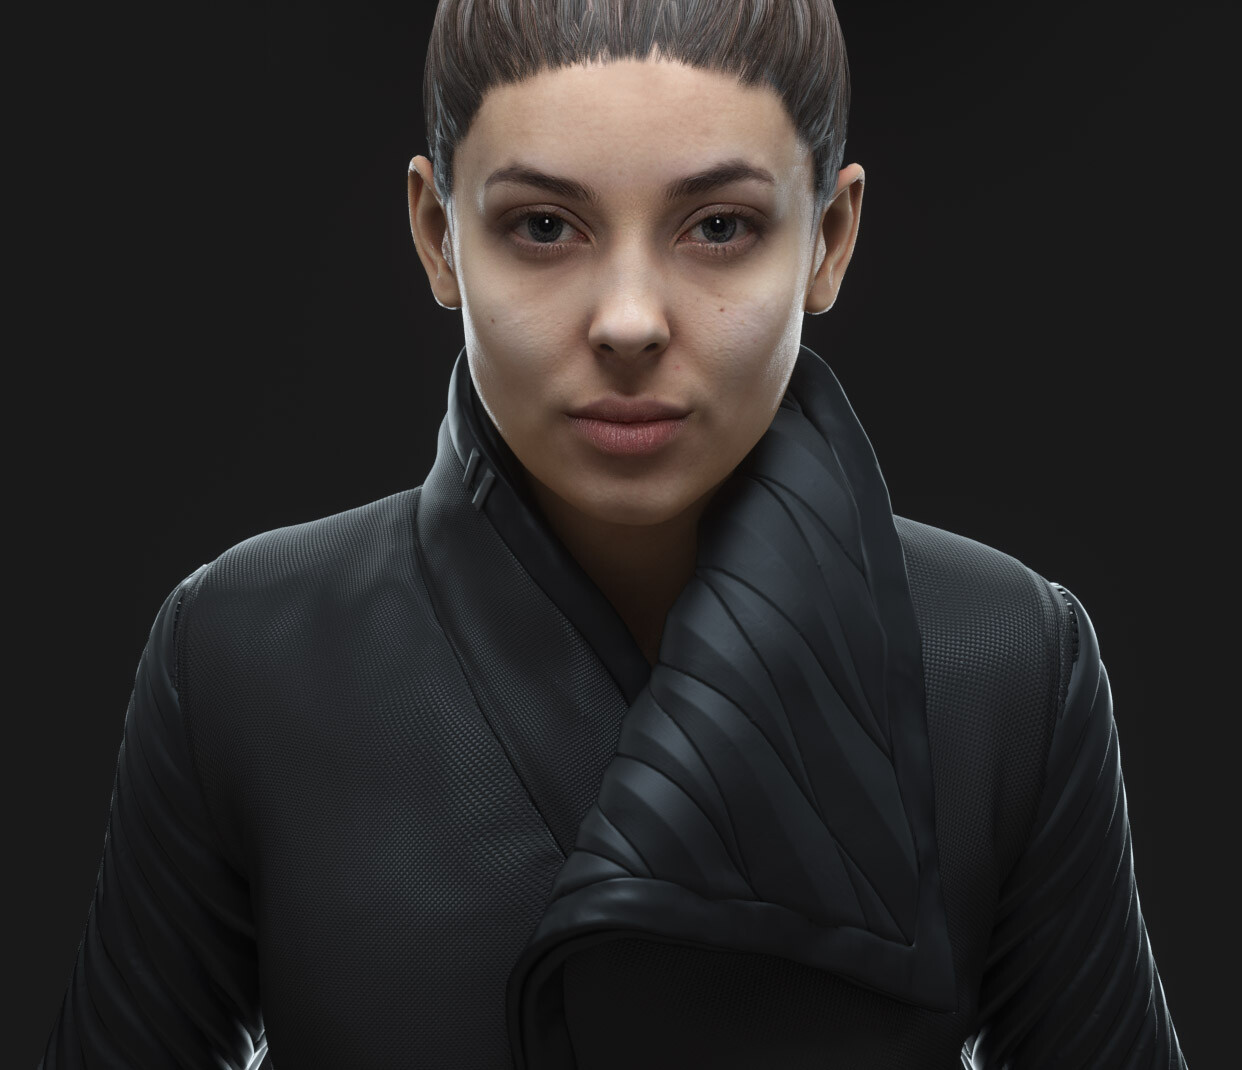 Elana wearing the Cyberpunk Jacket with a Sleeve Variant.